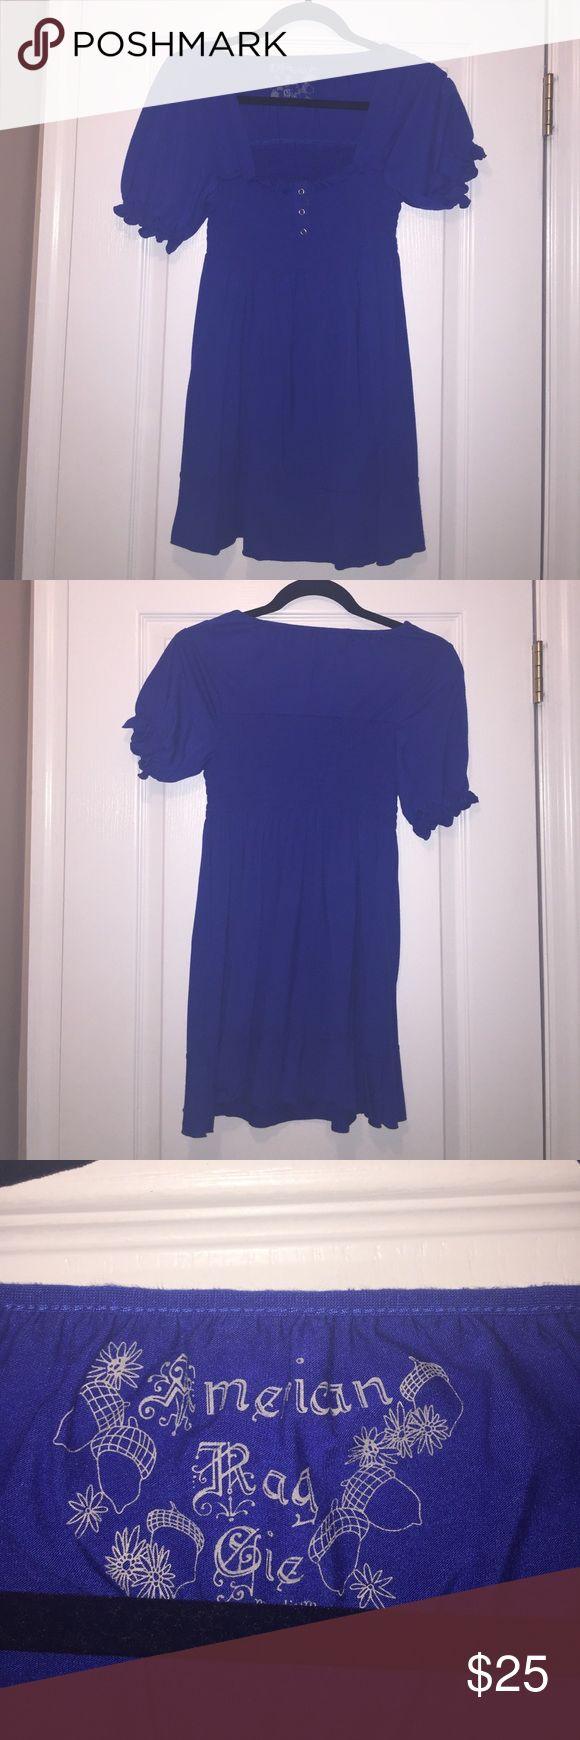 Royal blue American rag shirt Royal blue American rag shirt size medium.  Cute sleeves flares out on bottom. American Rag Tops Blouses